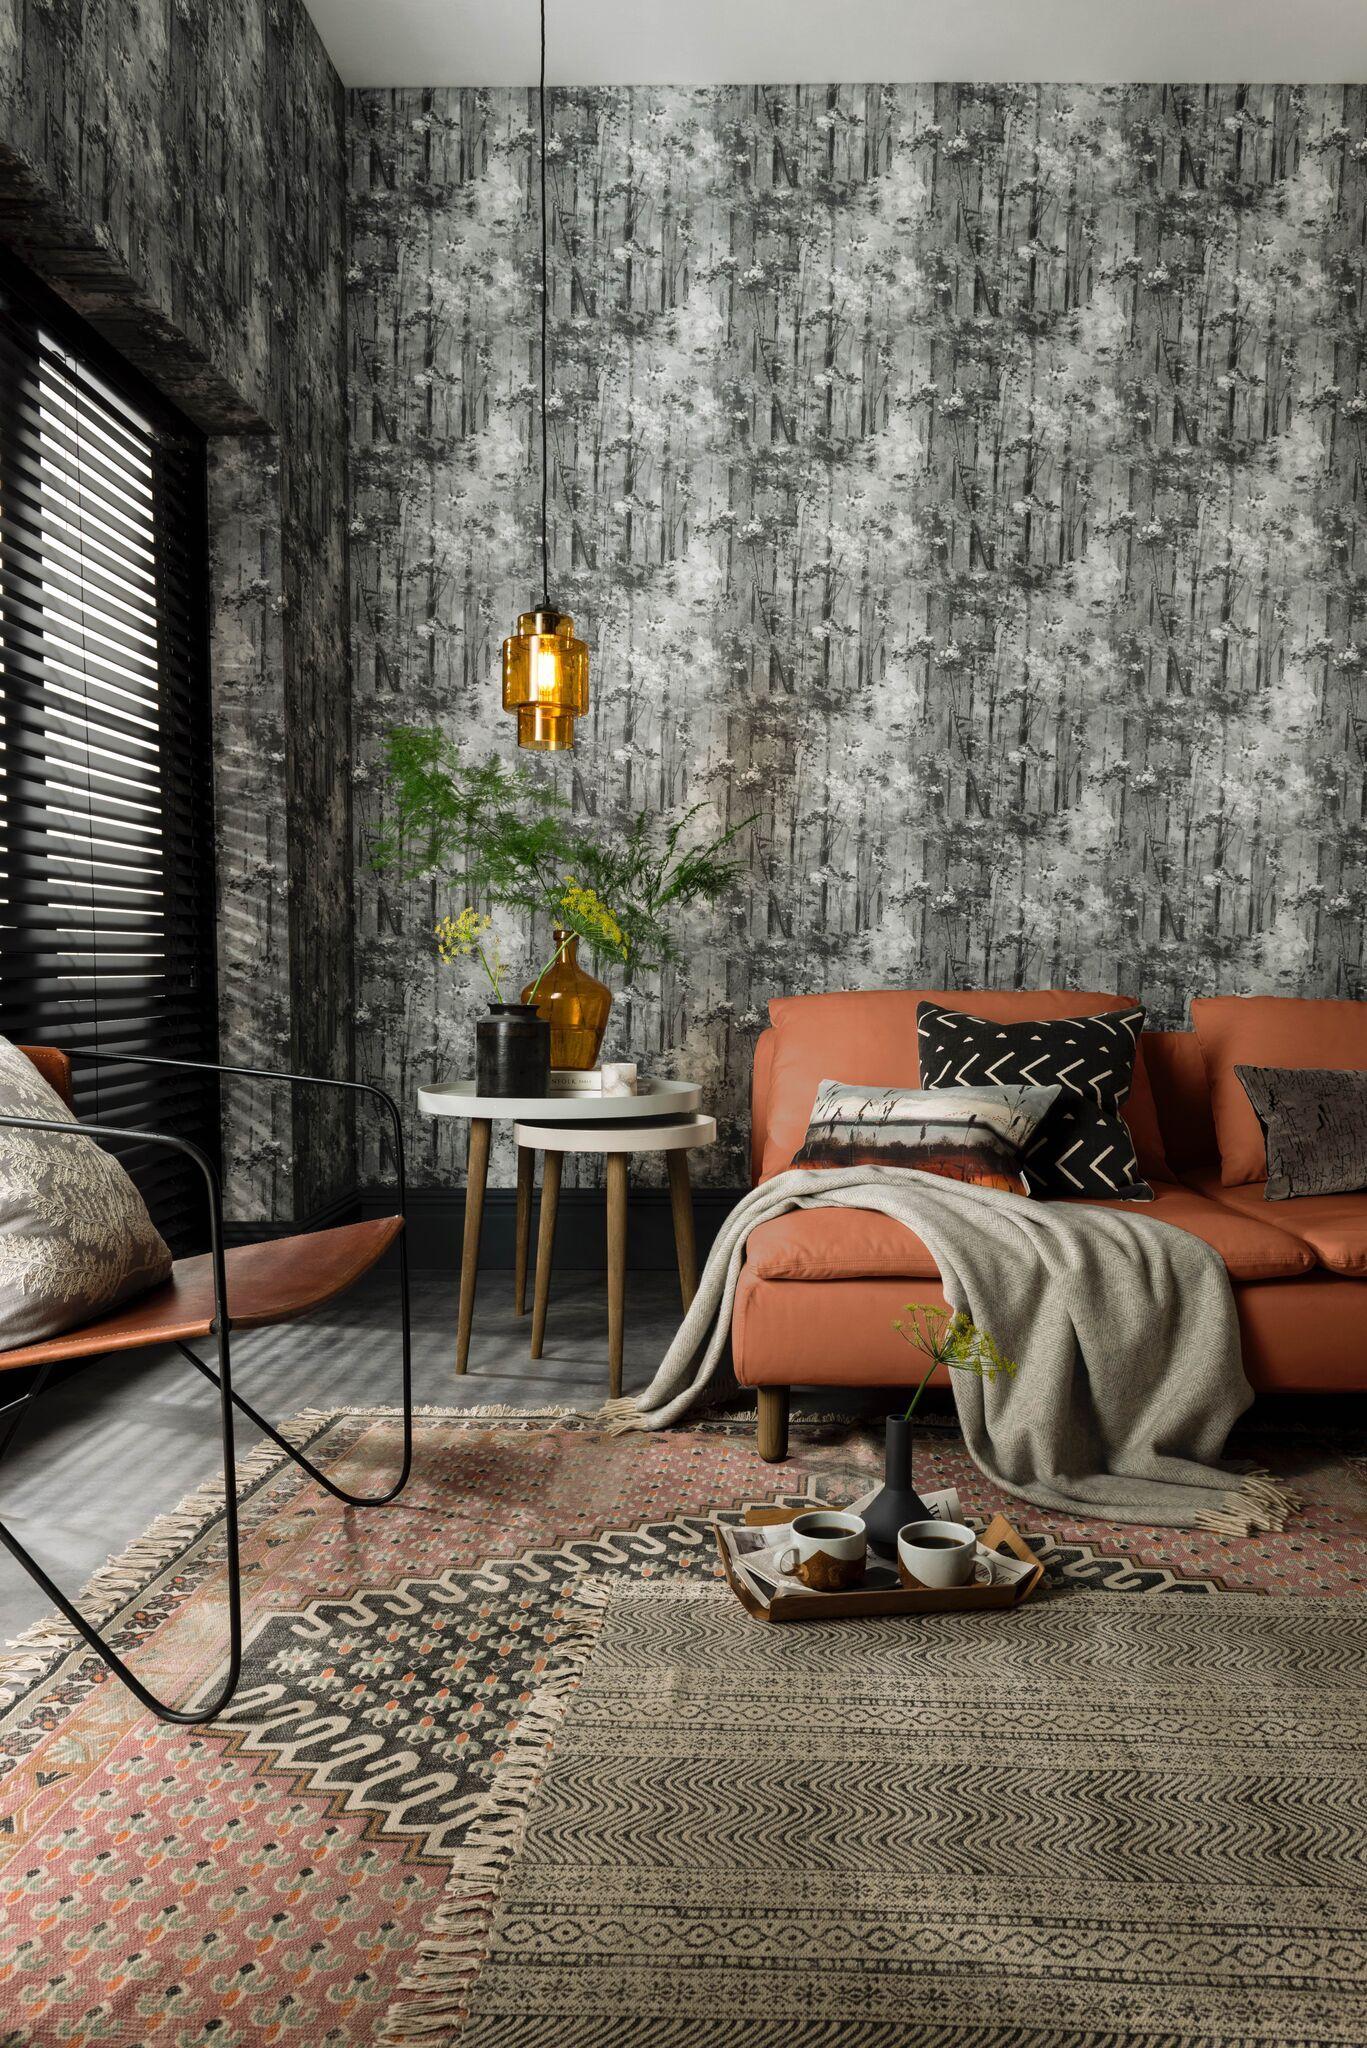 Tree Design Wallpaper Living Room: Glade Jet-1838 Wallcoverings